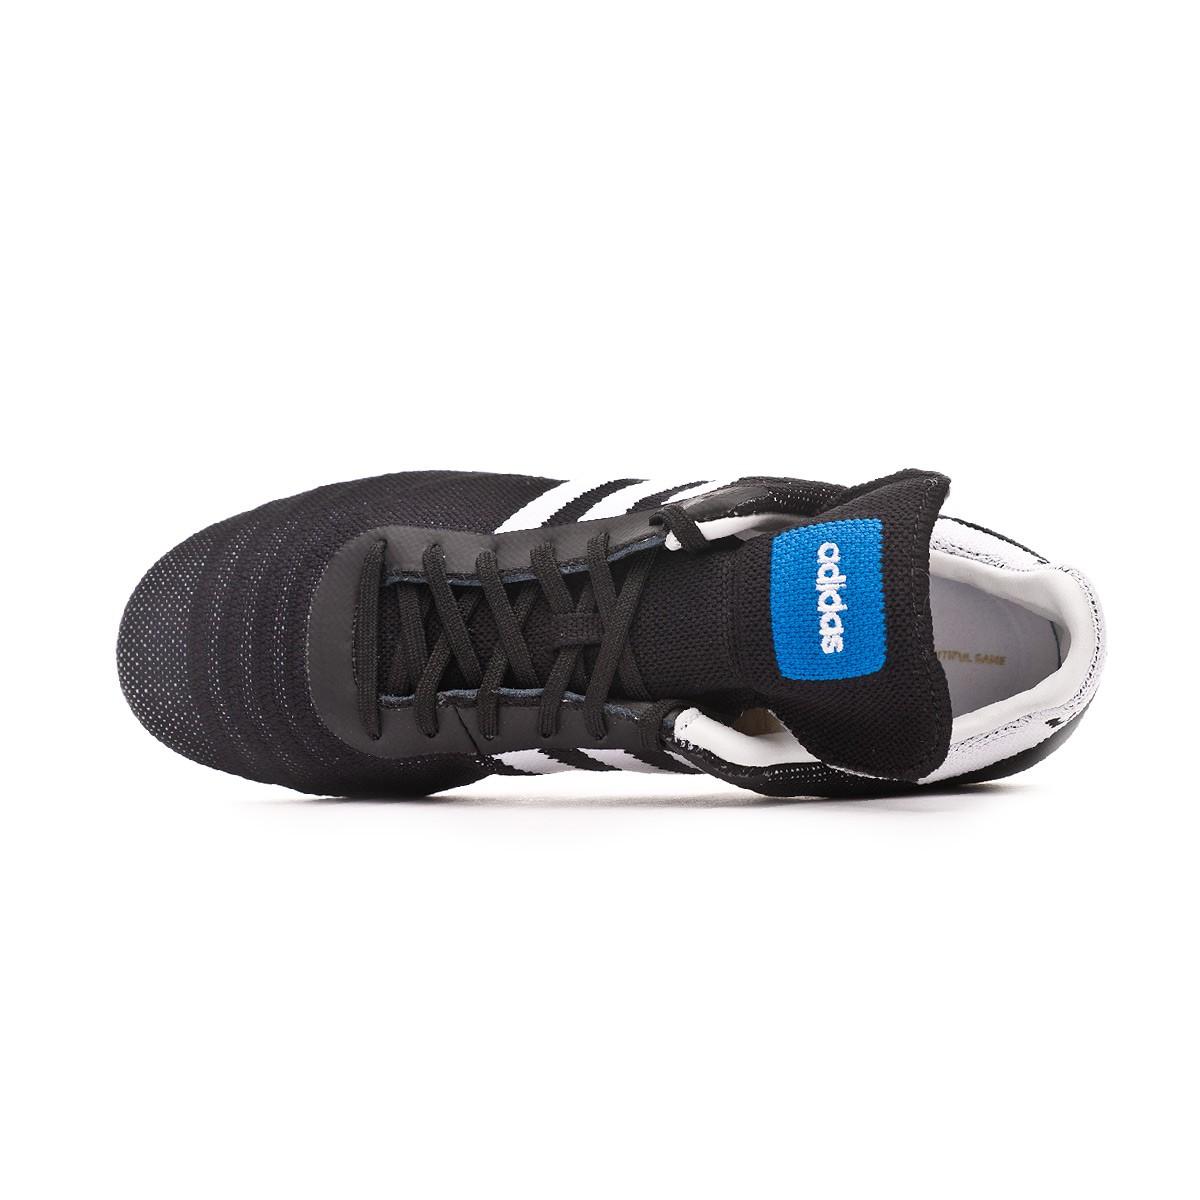 Copa Fg Tienda Fútbol Red Black 70y De White Core Zapatos Adidas twXOSnq